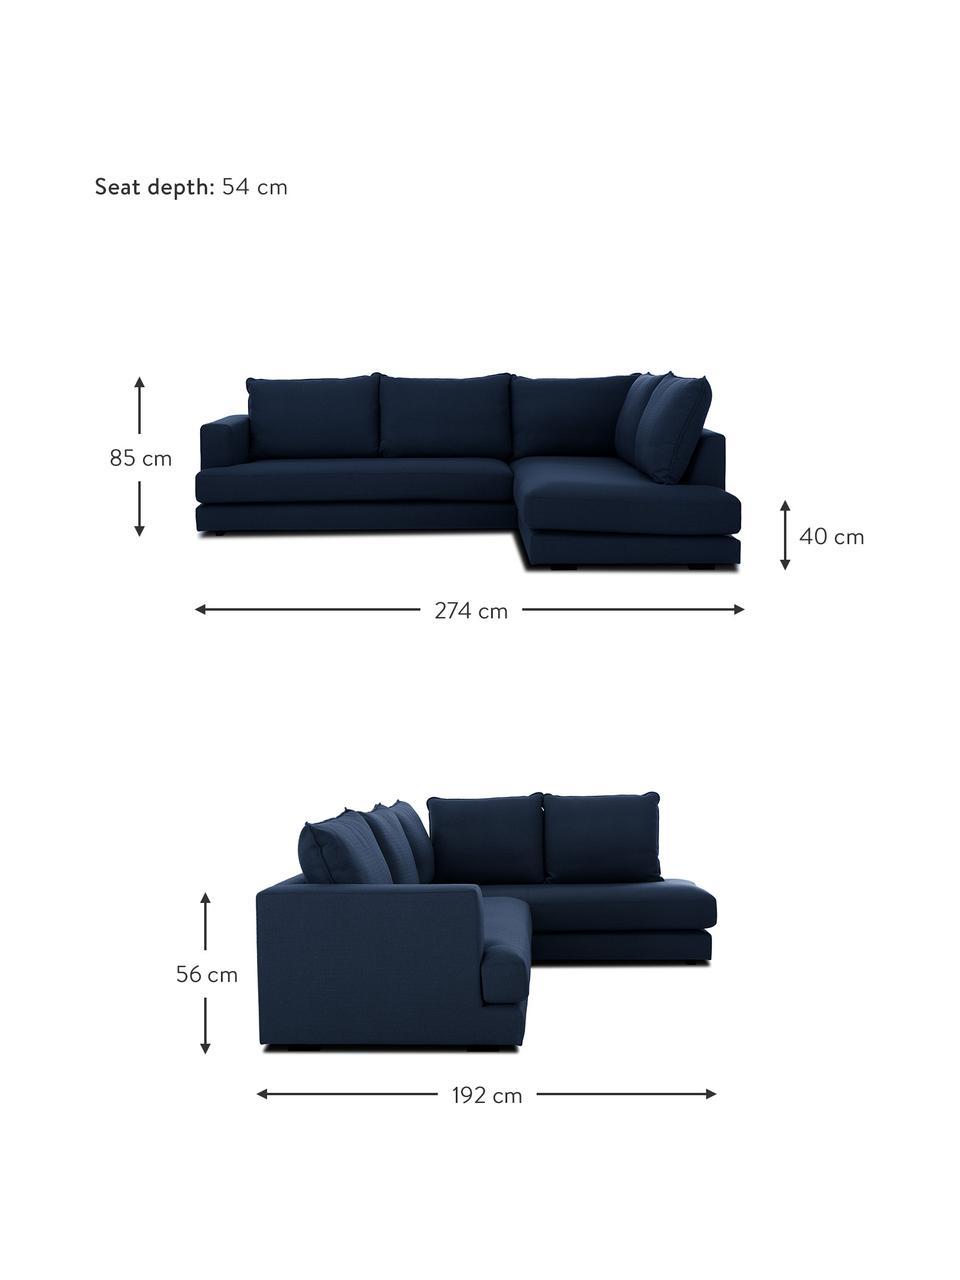 Grote hoekbank Tribeca in donkerblauw, Bekleding: polyester, Frame: massief grenenhout, Poten: massief gelakt beukenhout, Stof donkerblauw, B 274 x D 192 cm